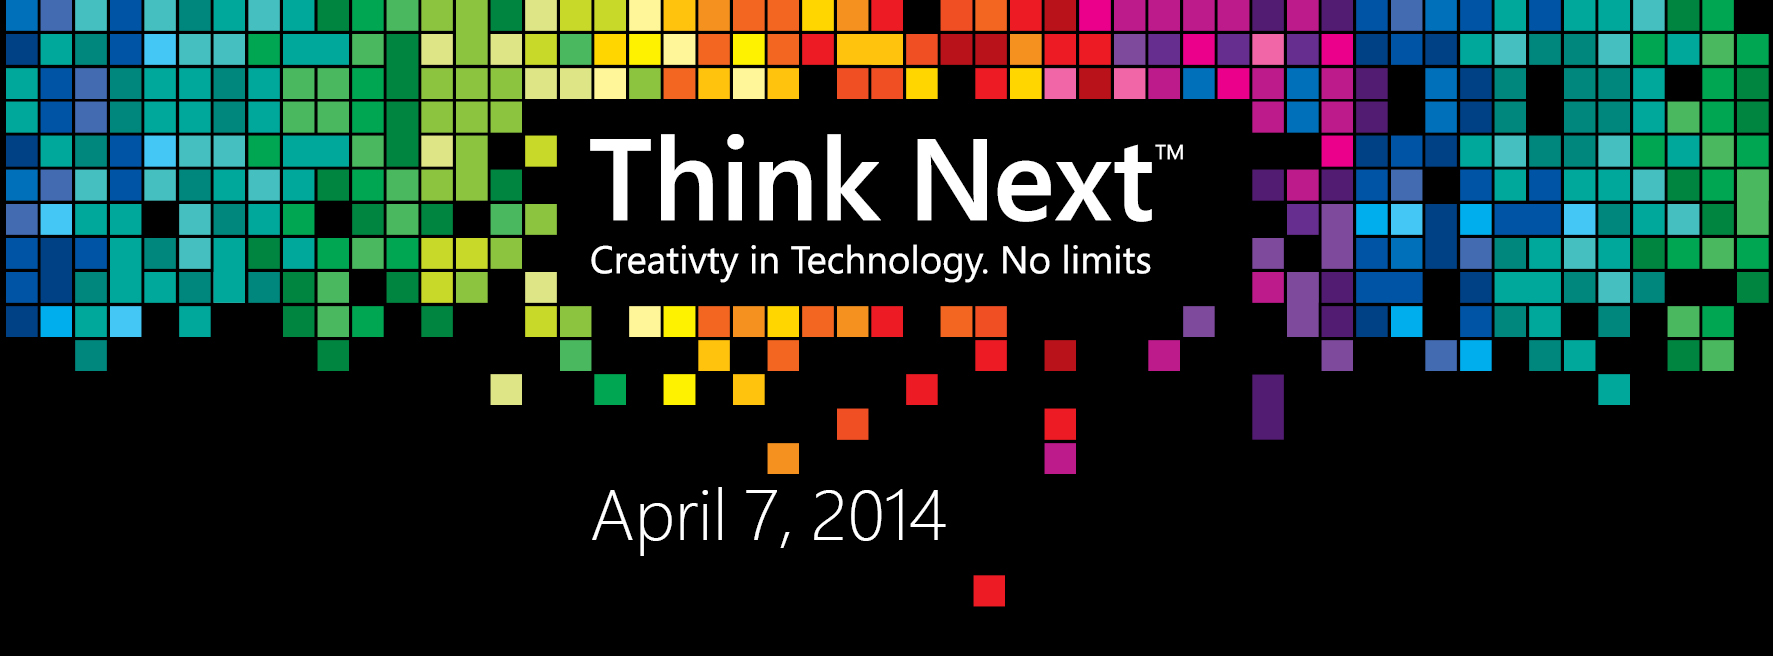 Think Next 2014